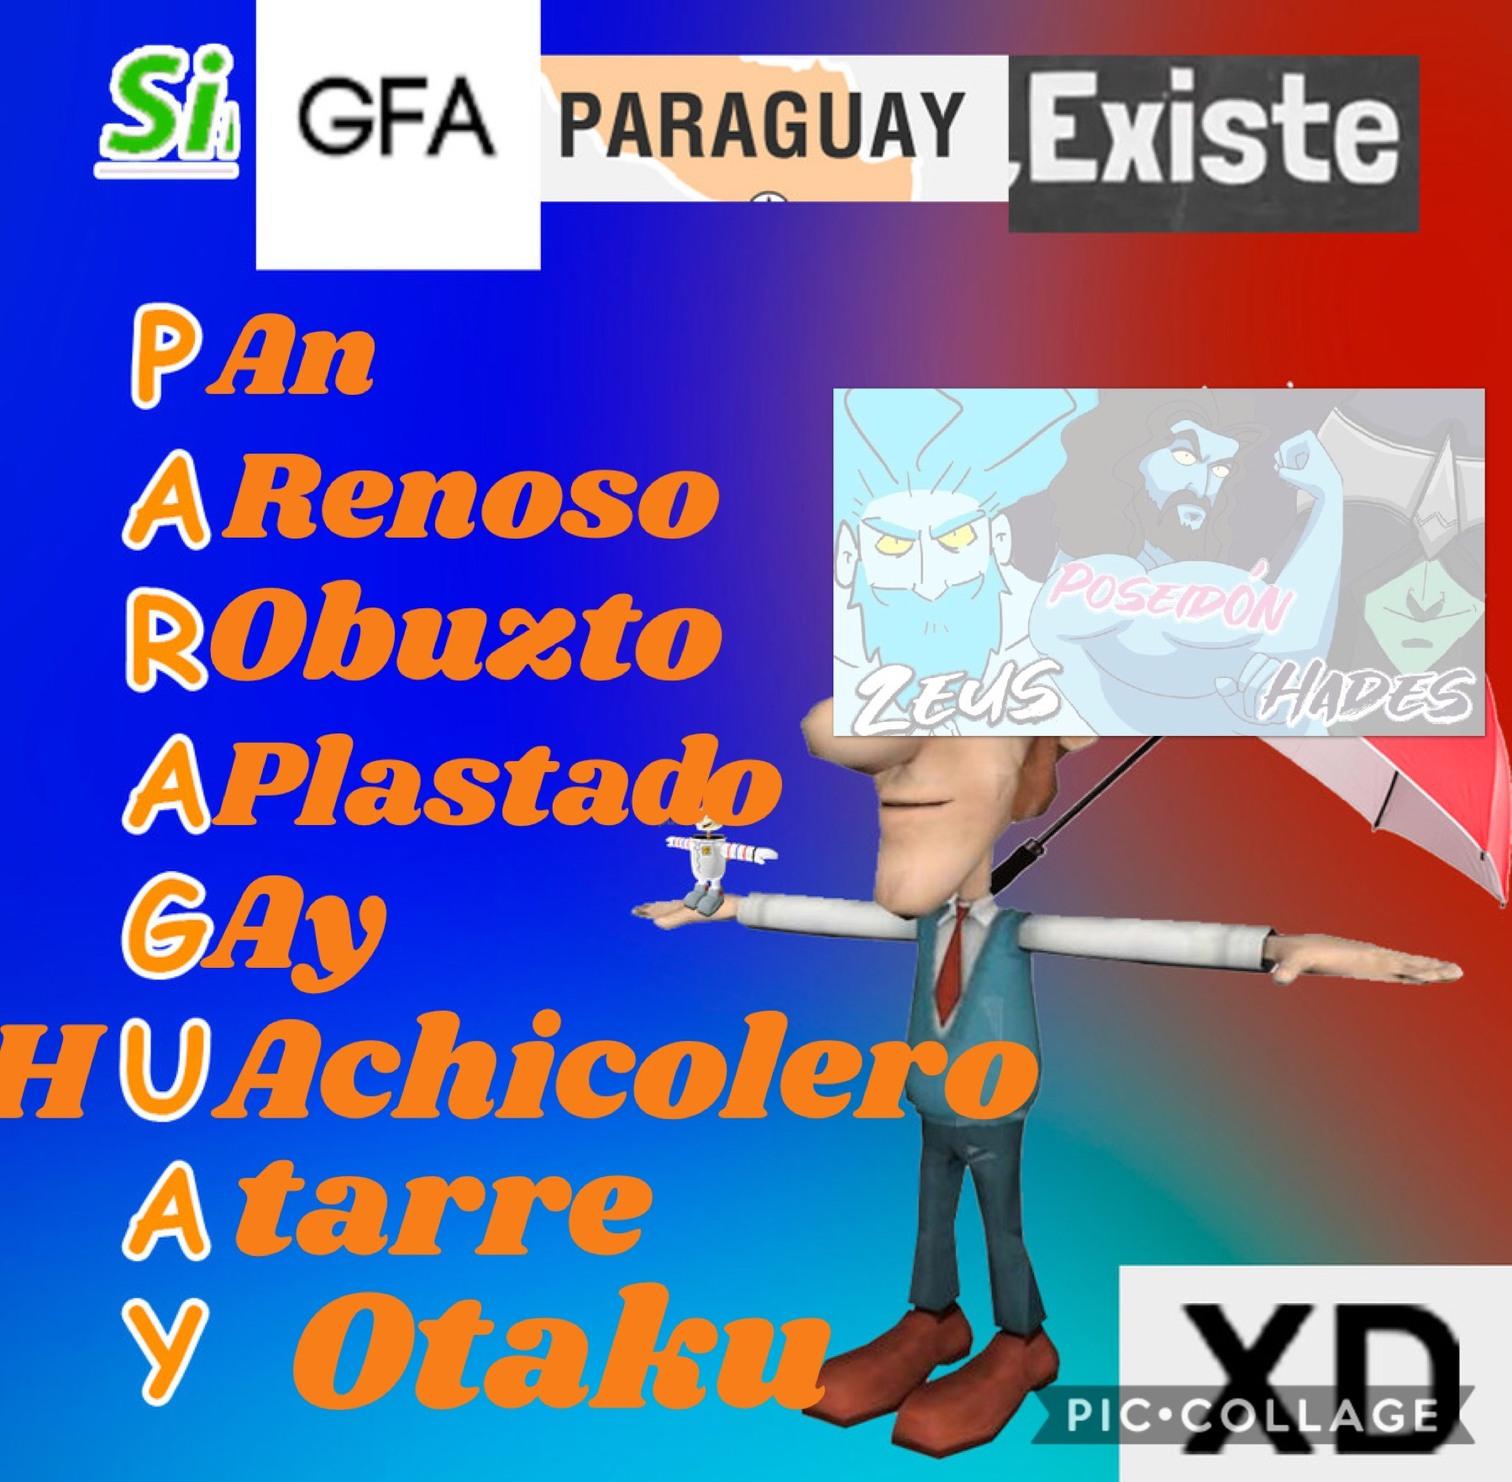 P.a.r.a.g.u.a.y. - meme